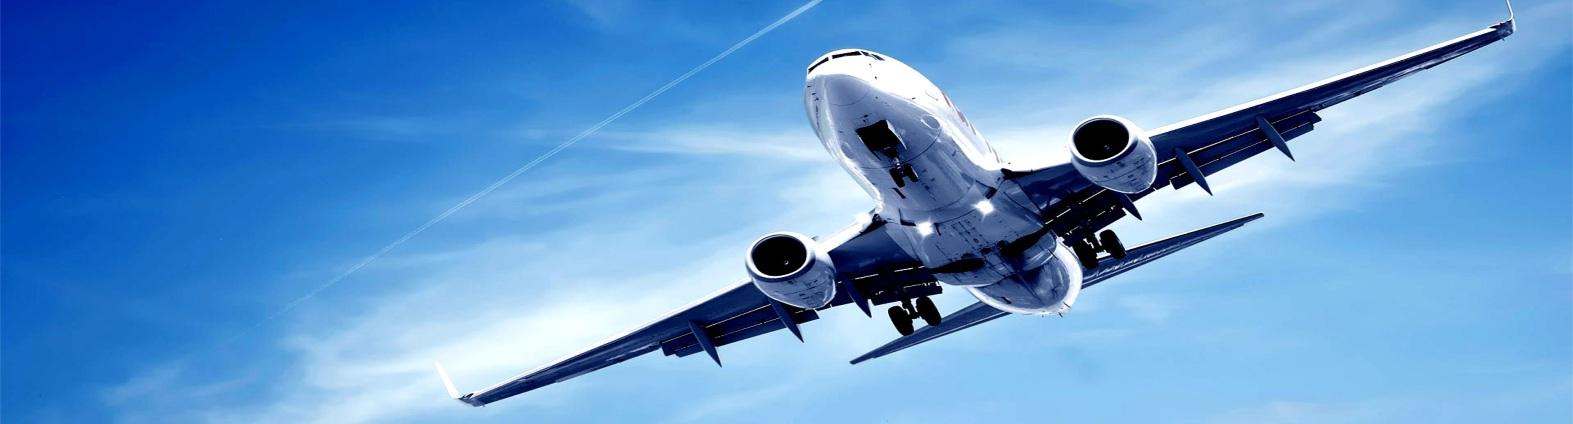 airnana-airline